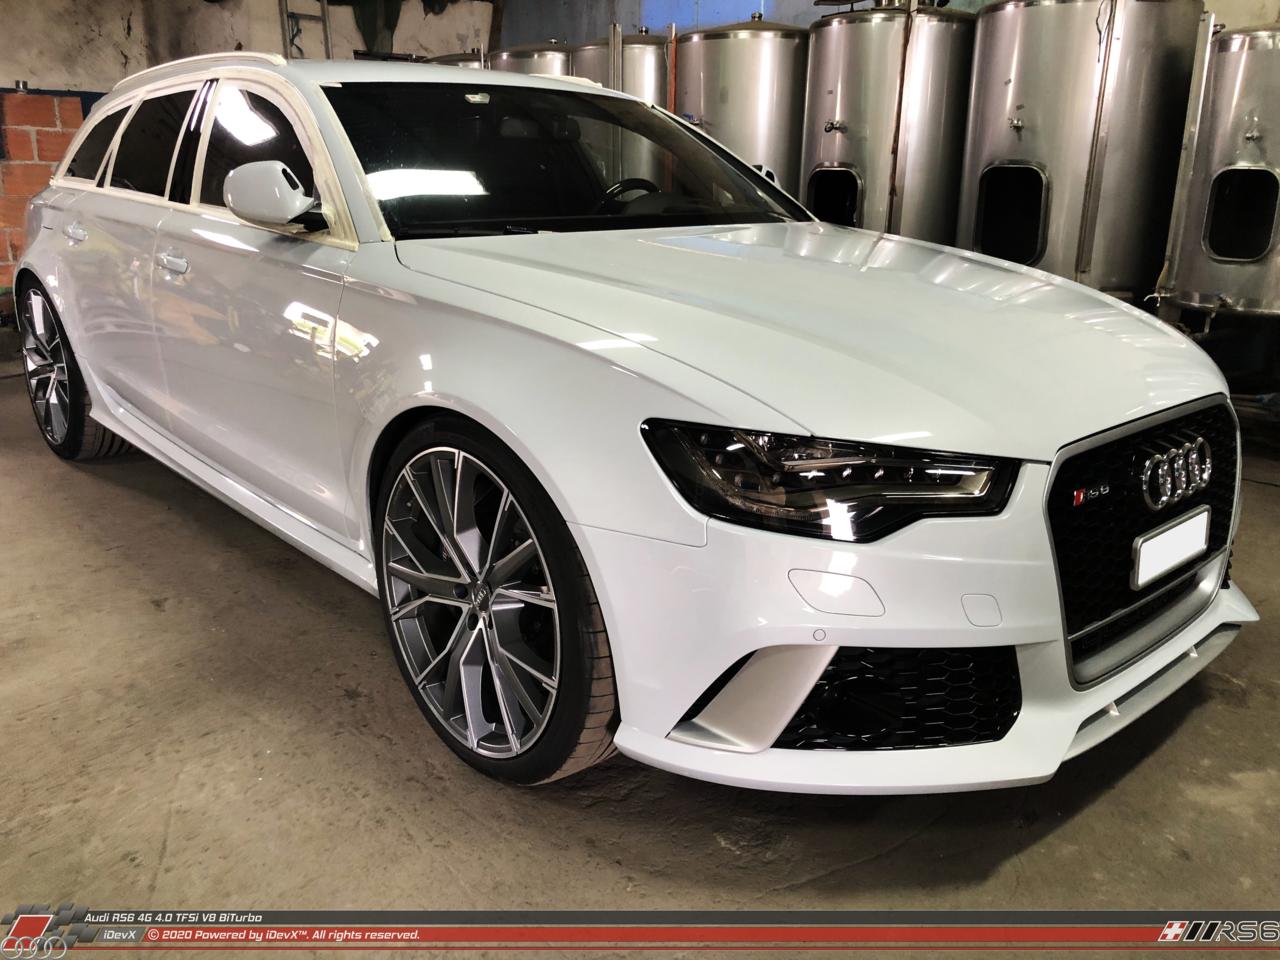 05_08.2019_Audi-RS6_iDevX_021.png